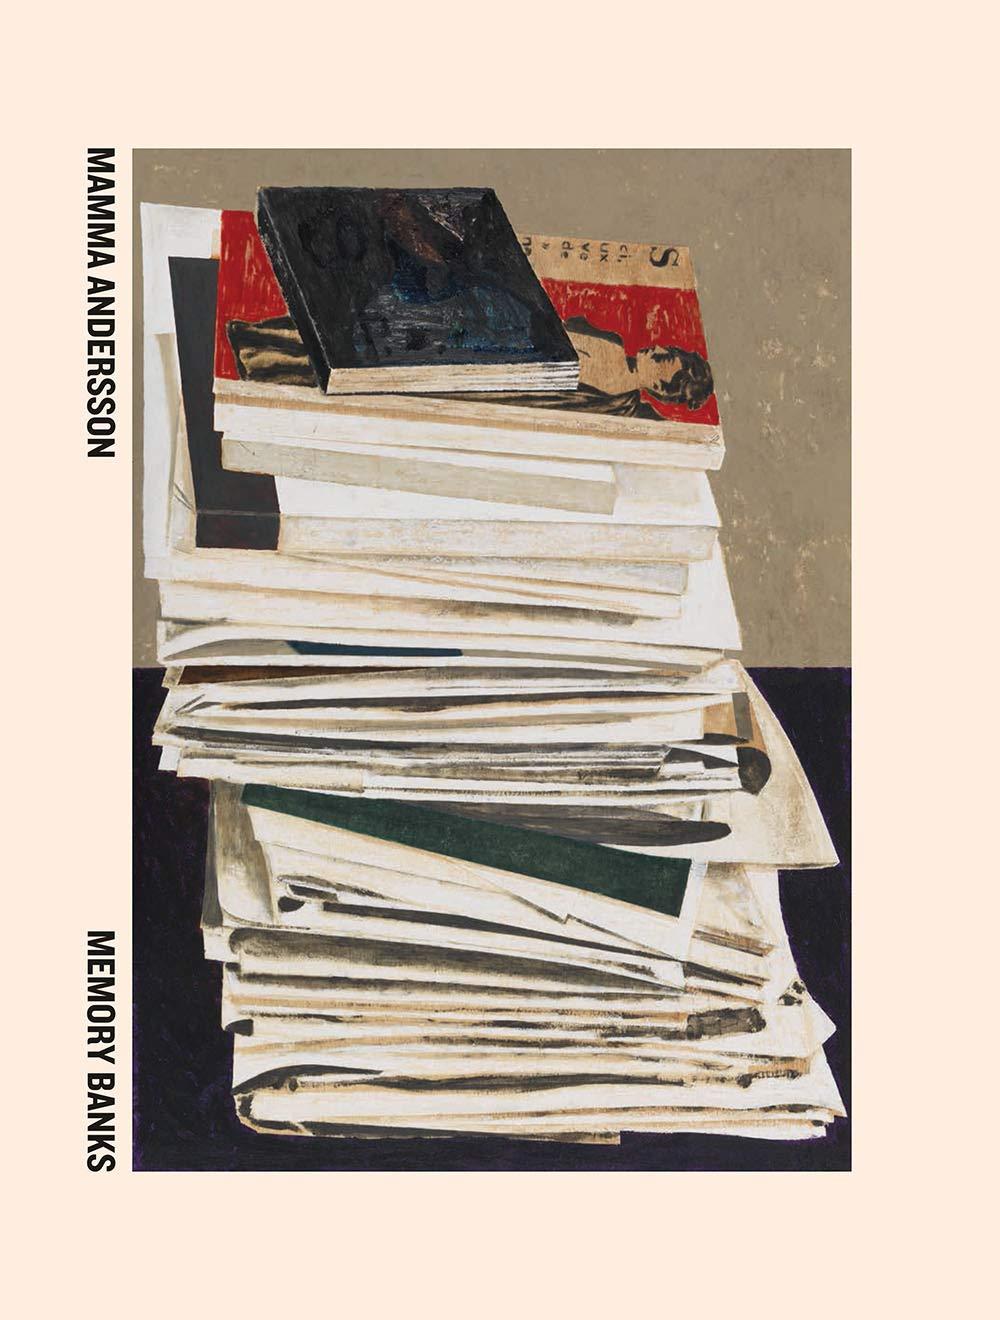 Karin Mamma Andersson : Memory banks (Anglais) Relié – 3 octobre 2018 Damiani 8862086016 Kunst allgemein ART / Mixed Media